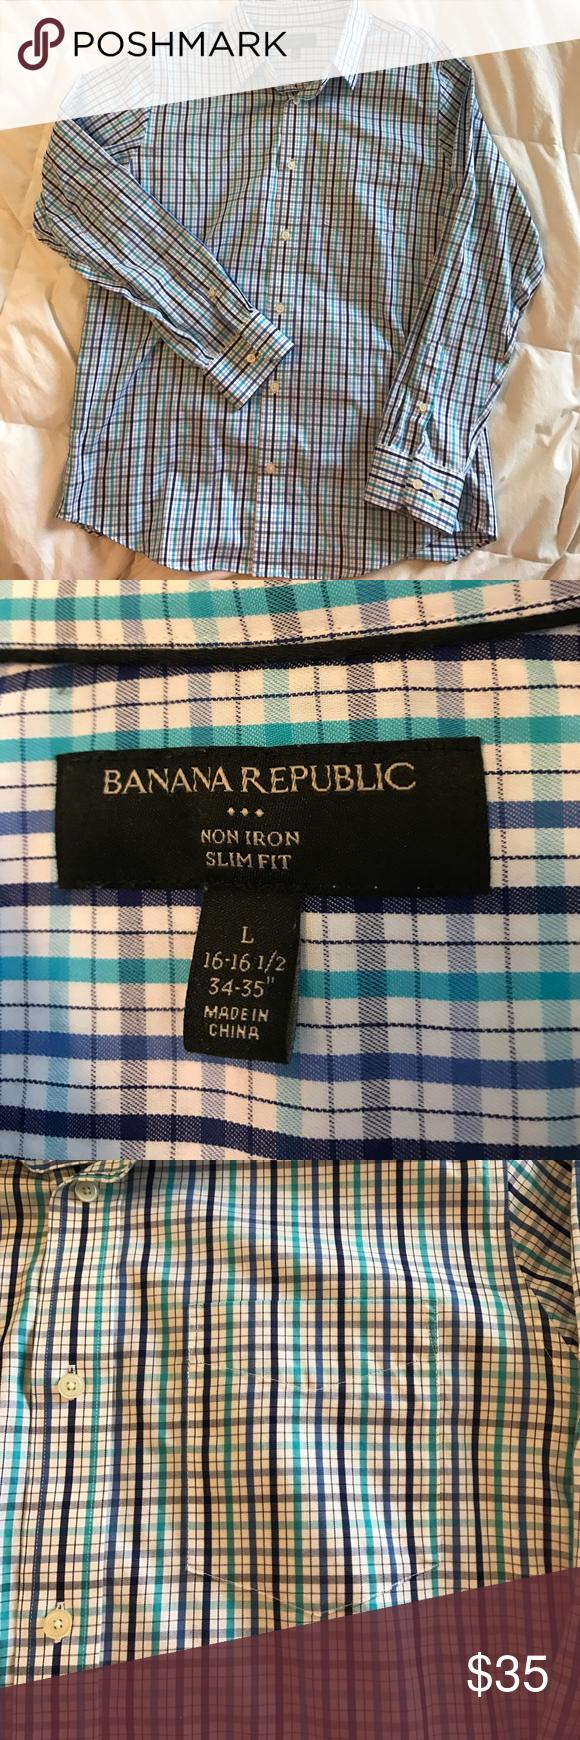 "Banana Republic non iron button down shirt Slim Fit/ non Iron/Multi colored blues, striped button down shirt. Pocket on left breast. Size L 16-16.5/34-35"" Banana Republic Shirts Casual Button Down Shirts"